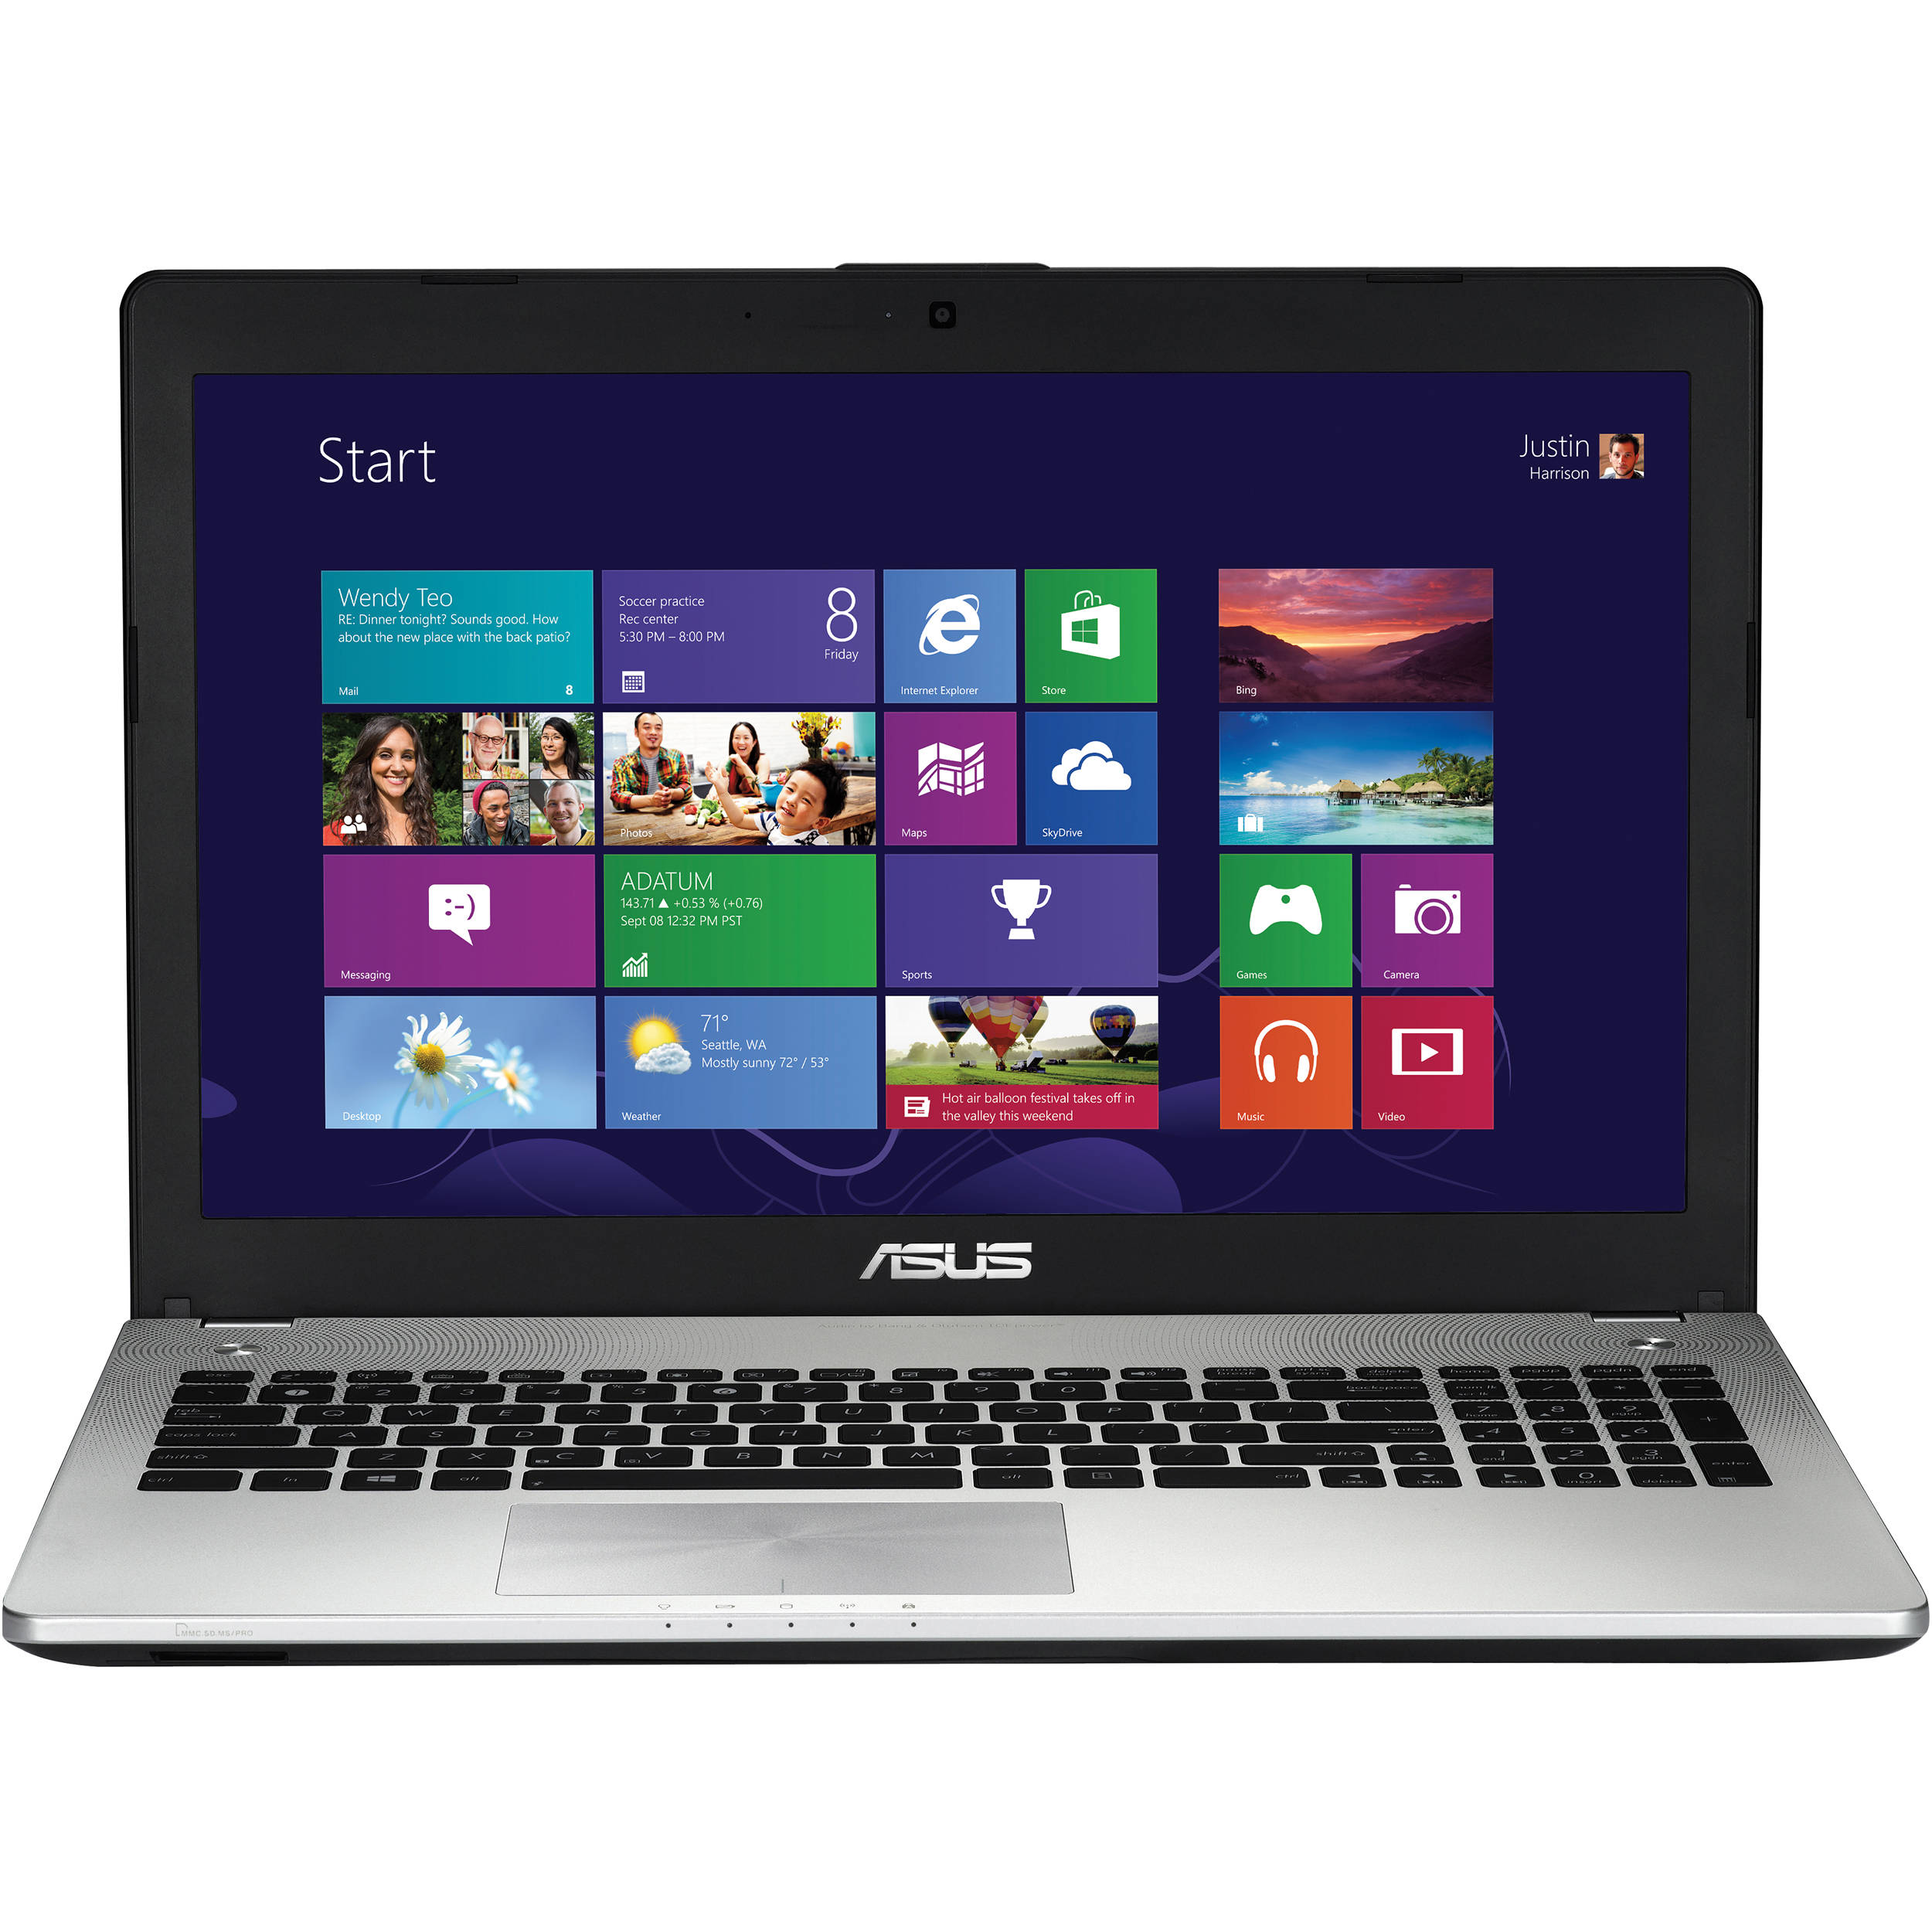 "ASUS N56JN-EB71 15.6"" Notebook Computer (Black Aluminum)"